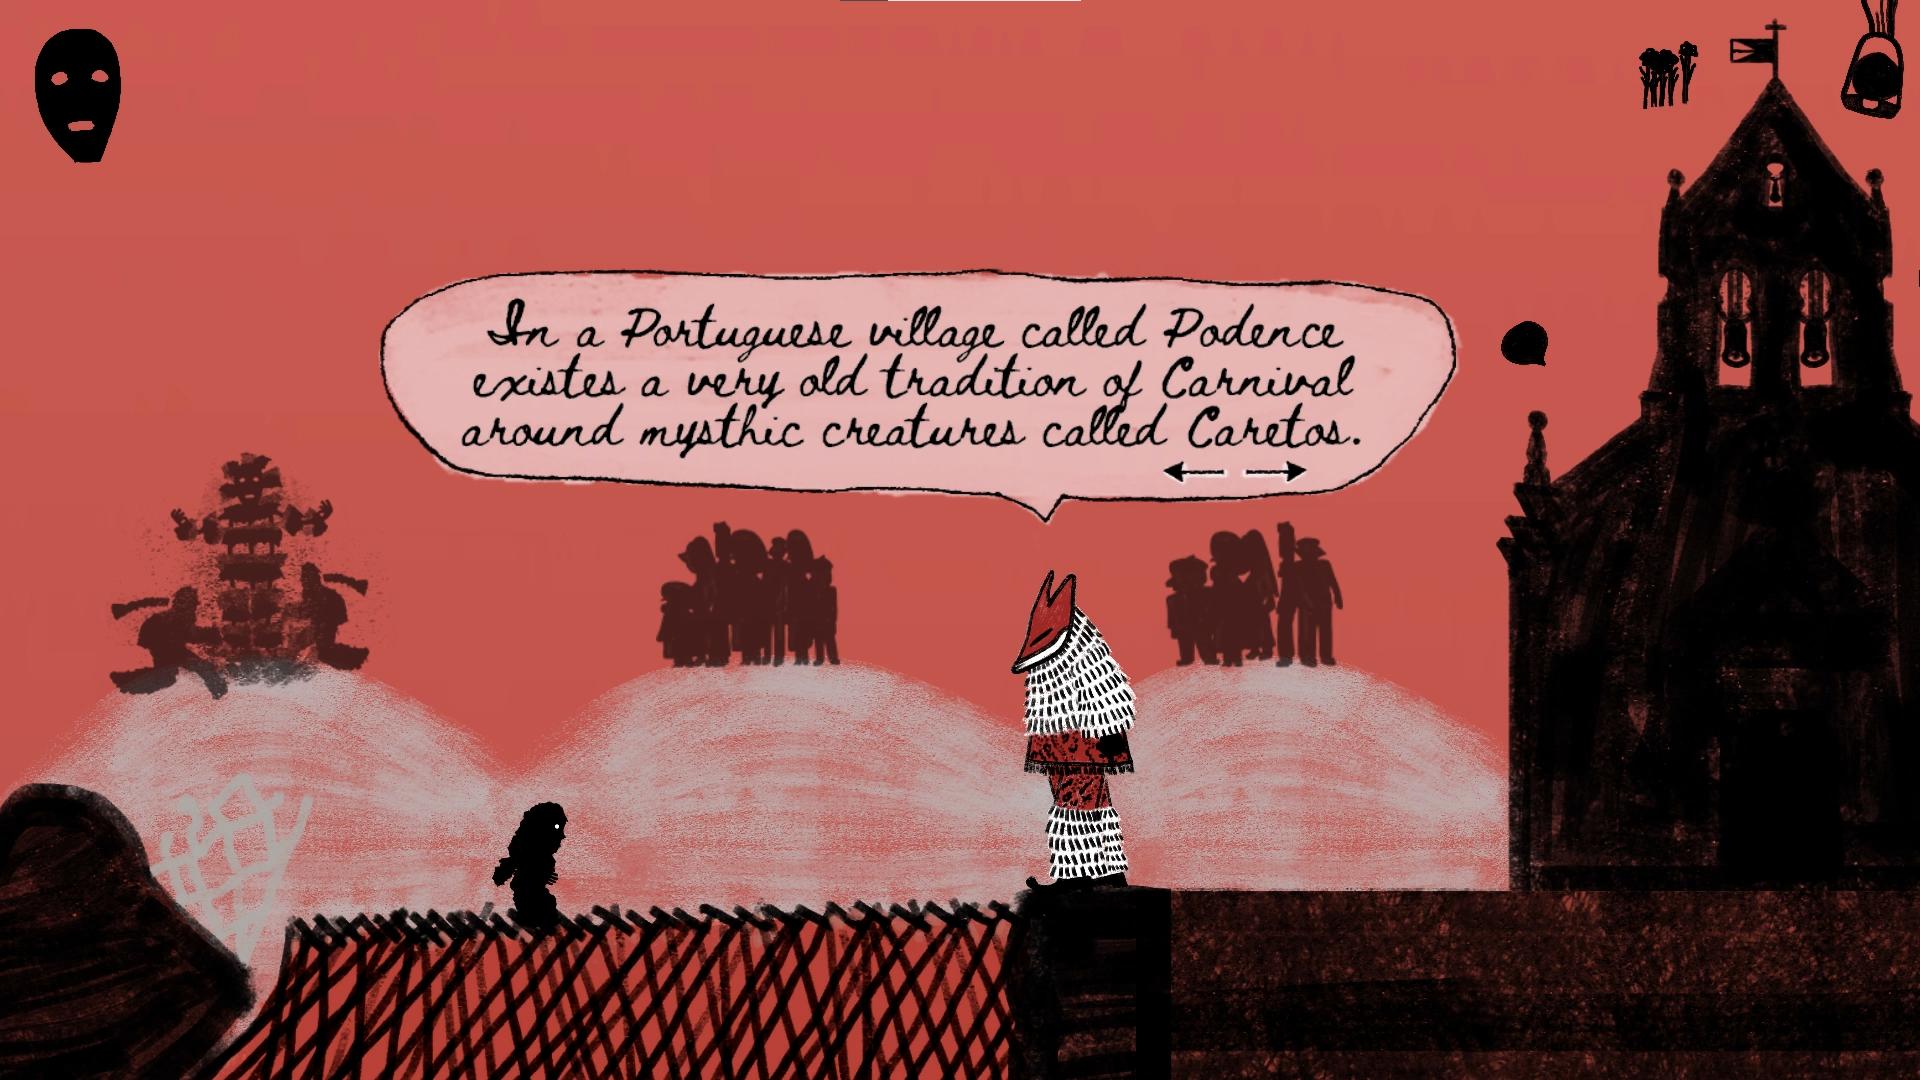 red_careto